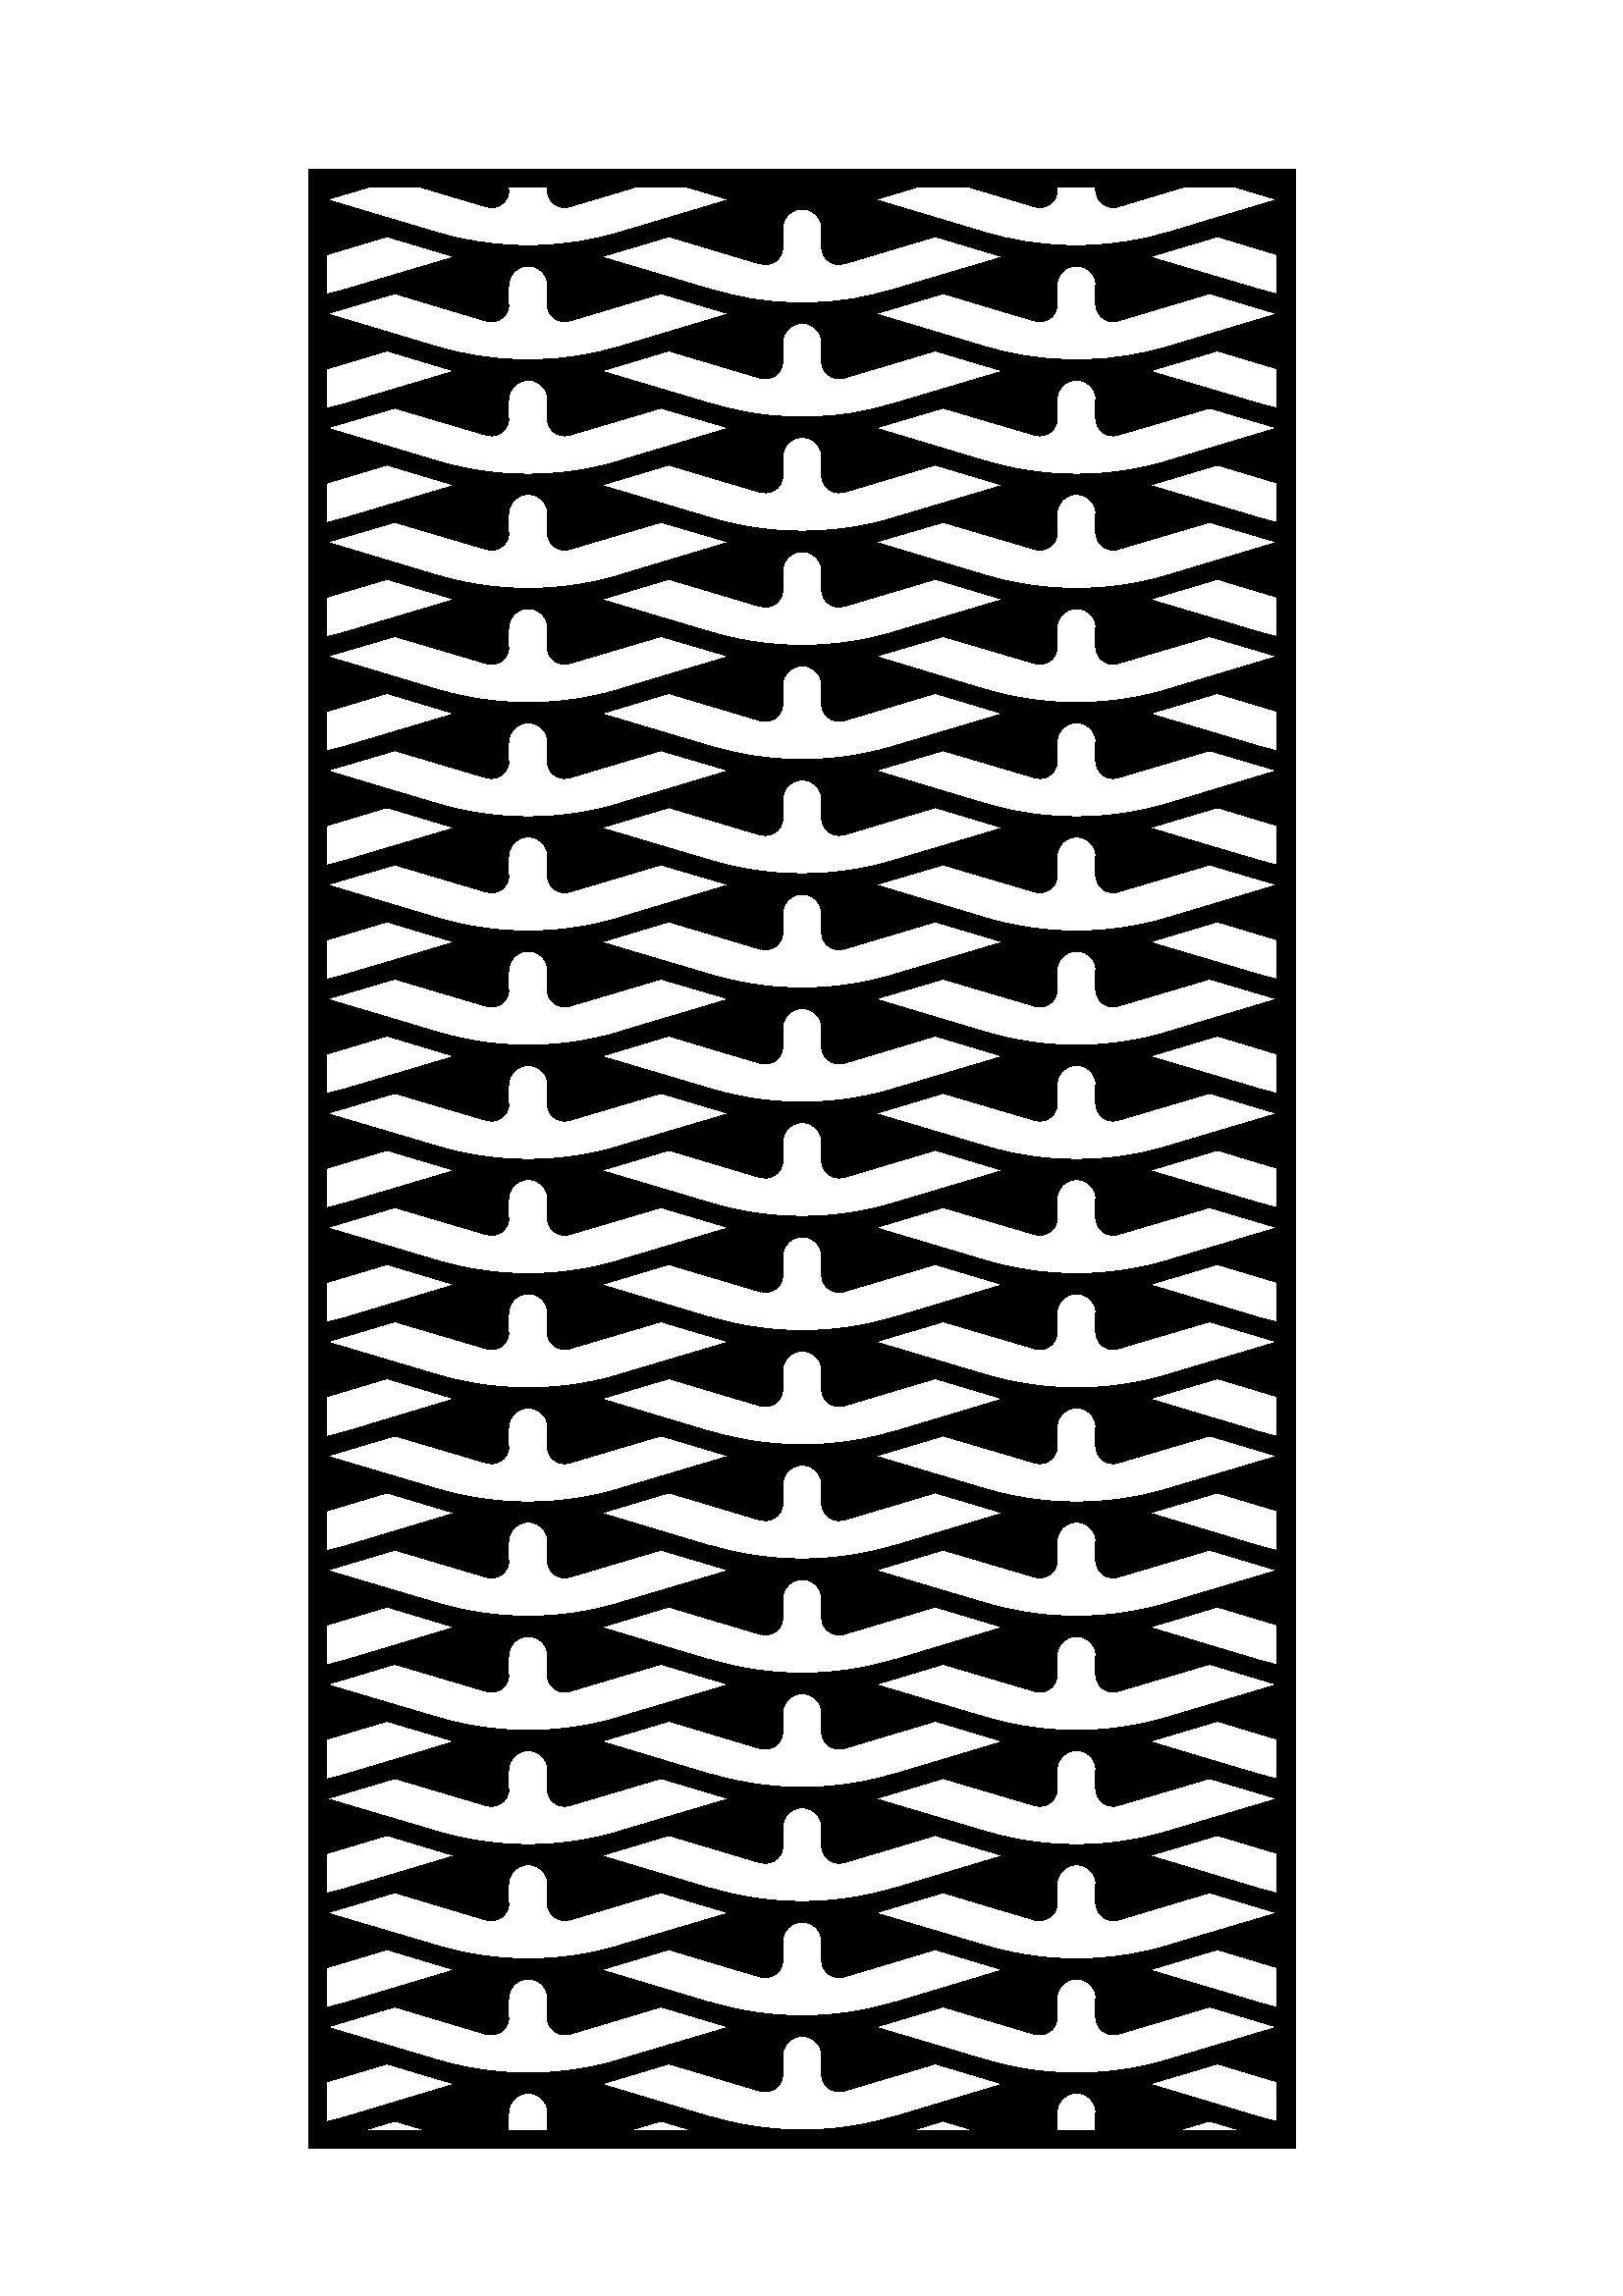 Plasma Table Artwork Patterns